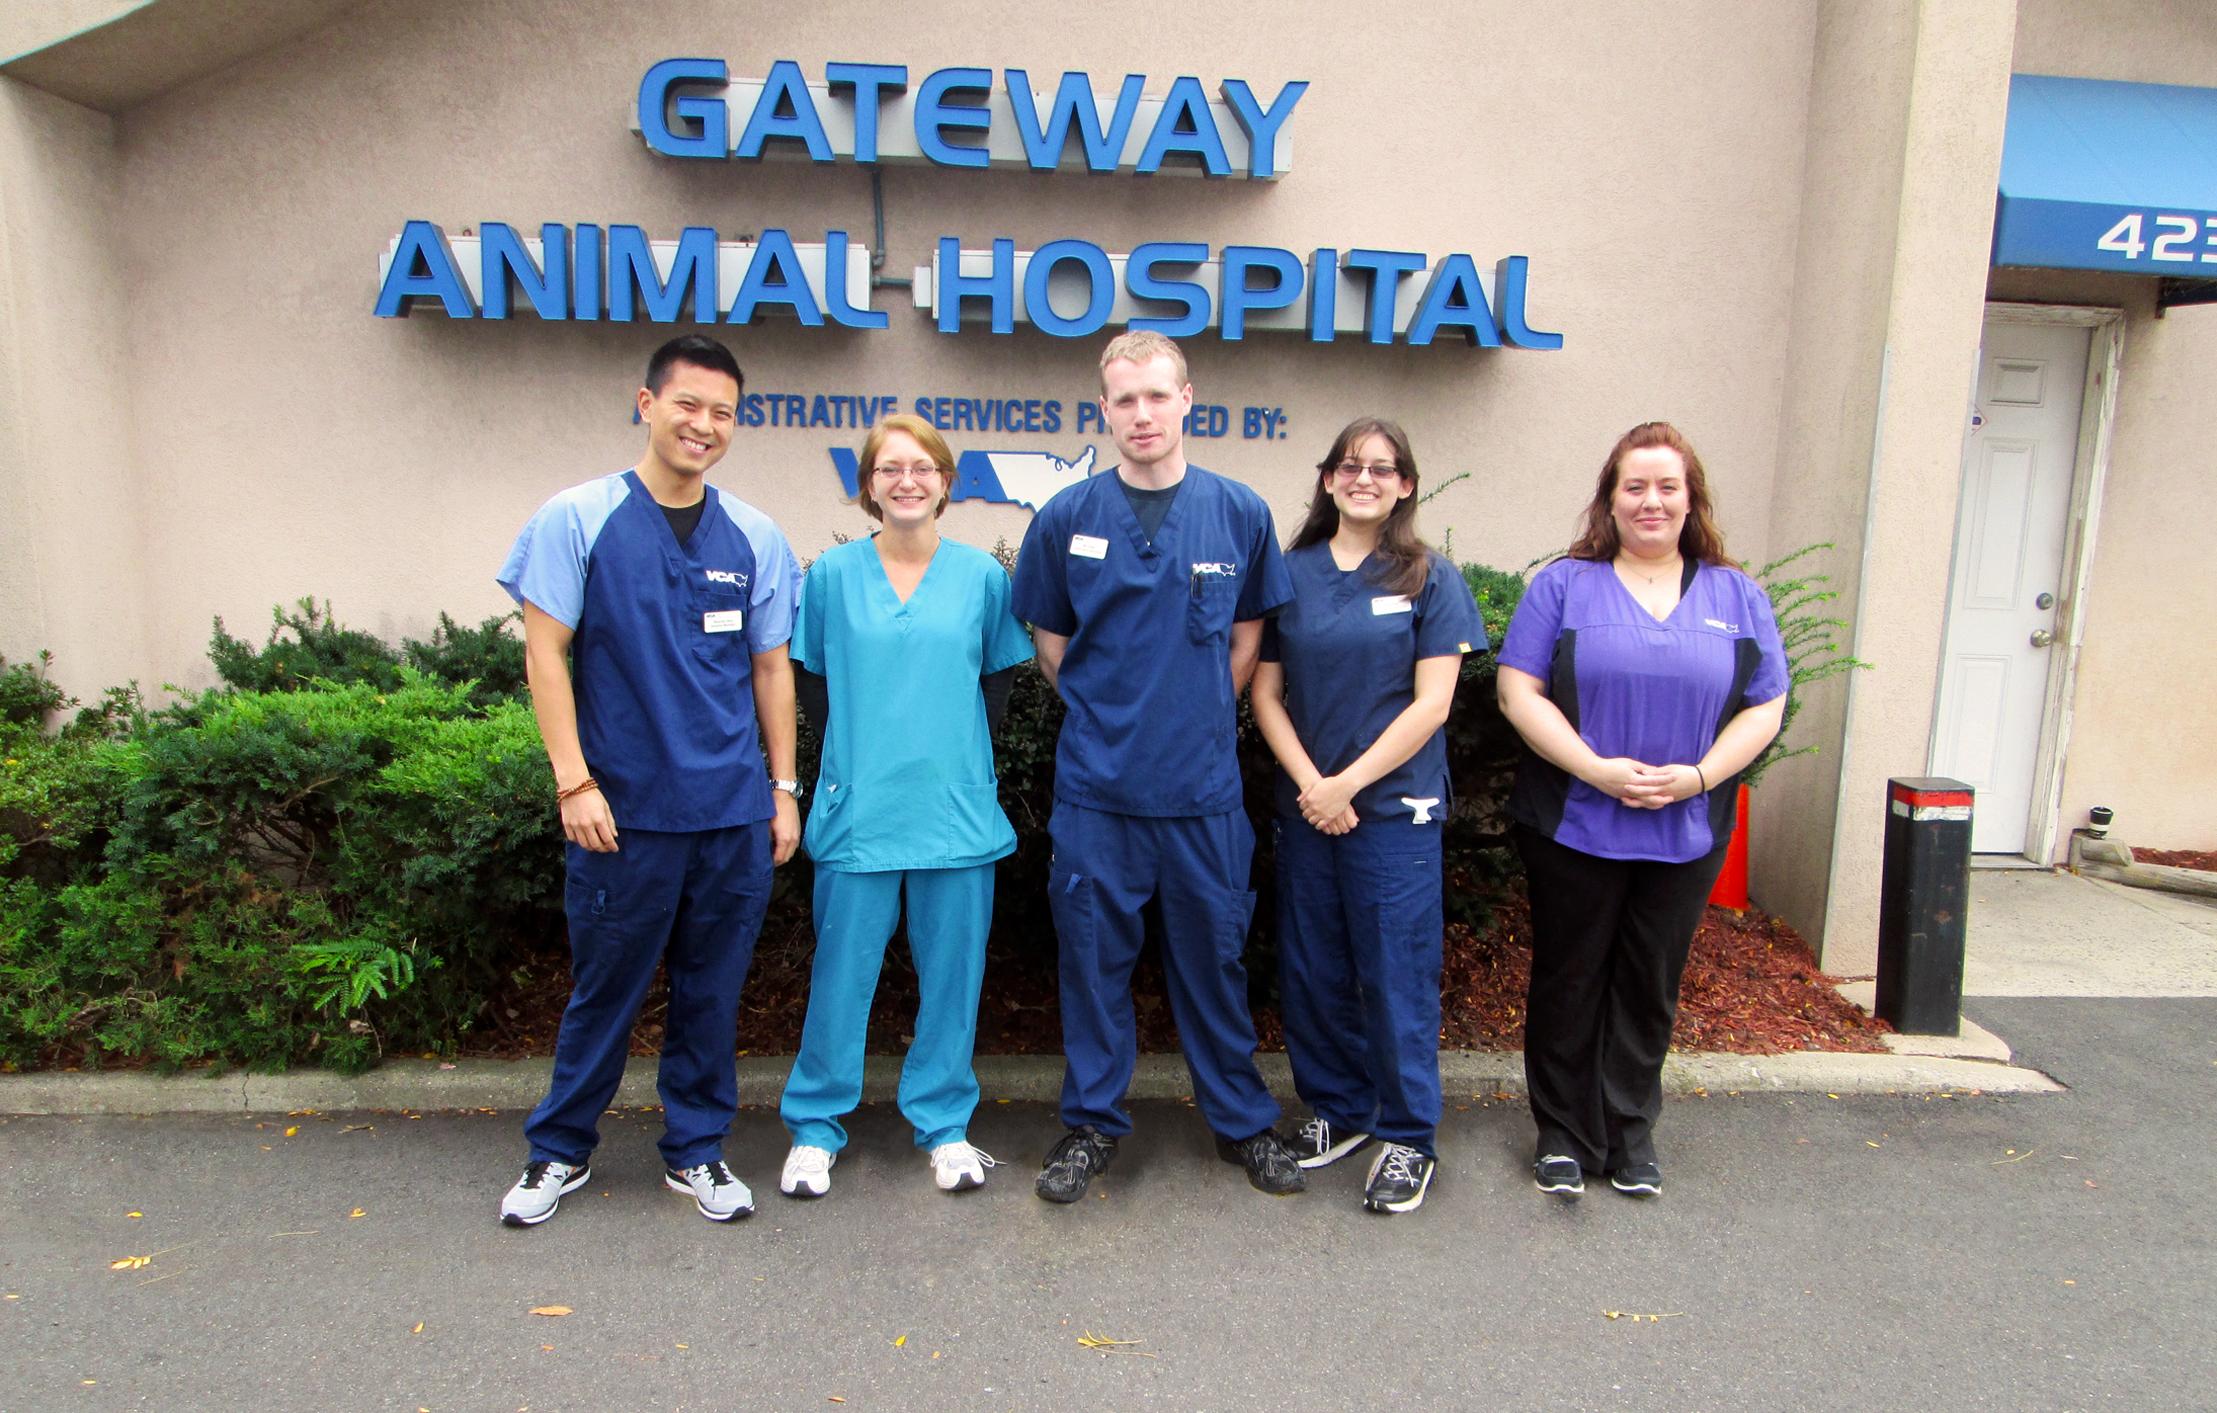 Vca Gateway Animal Hospital Staten Island